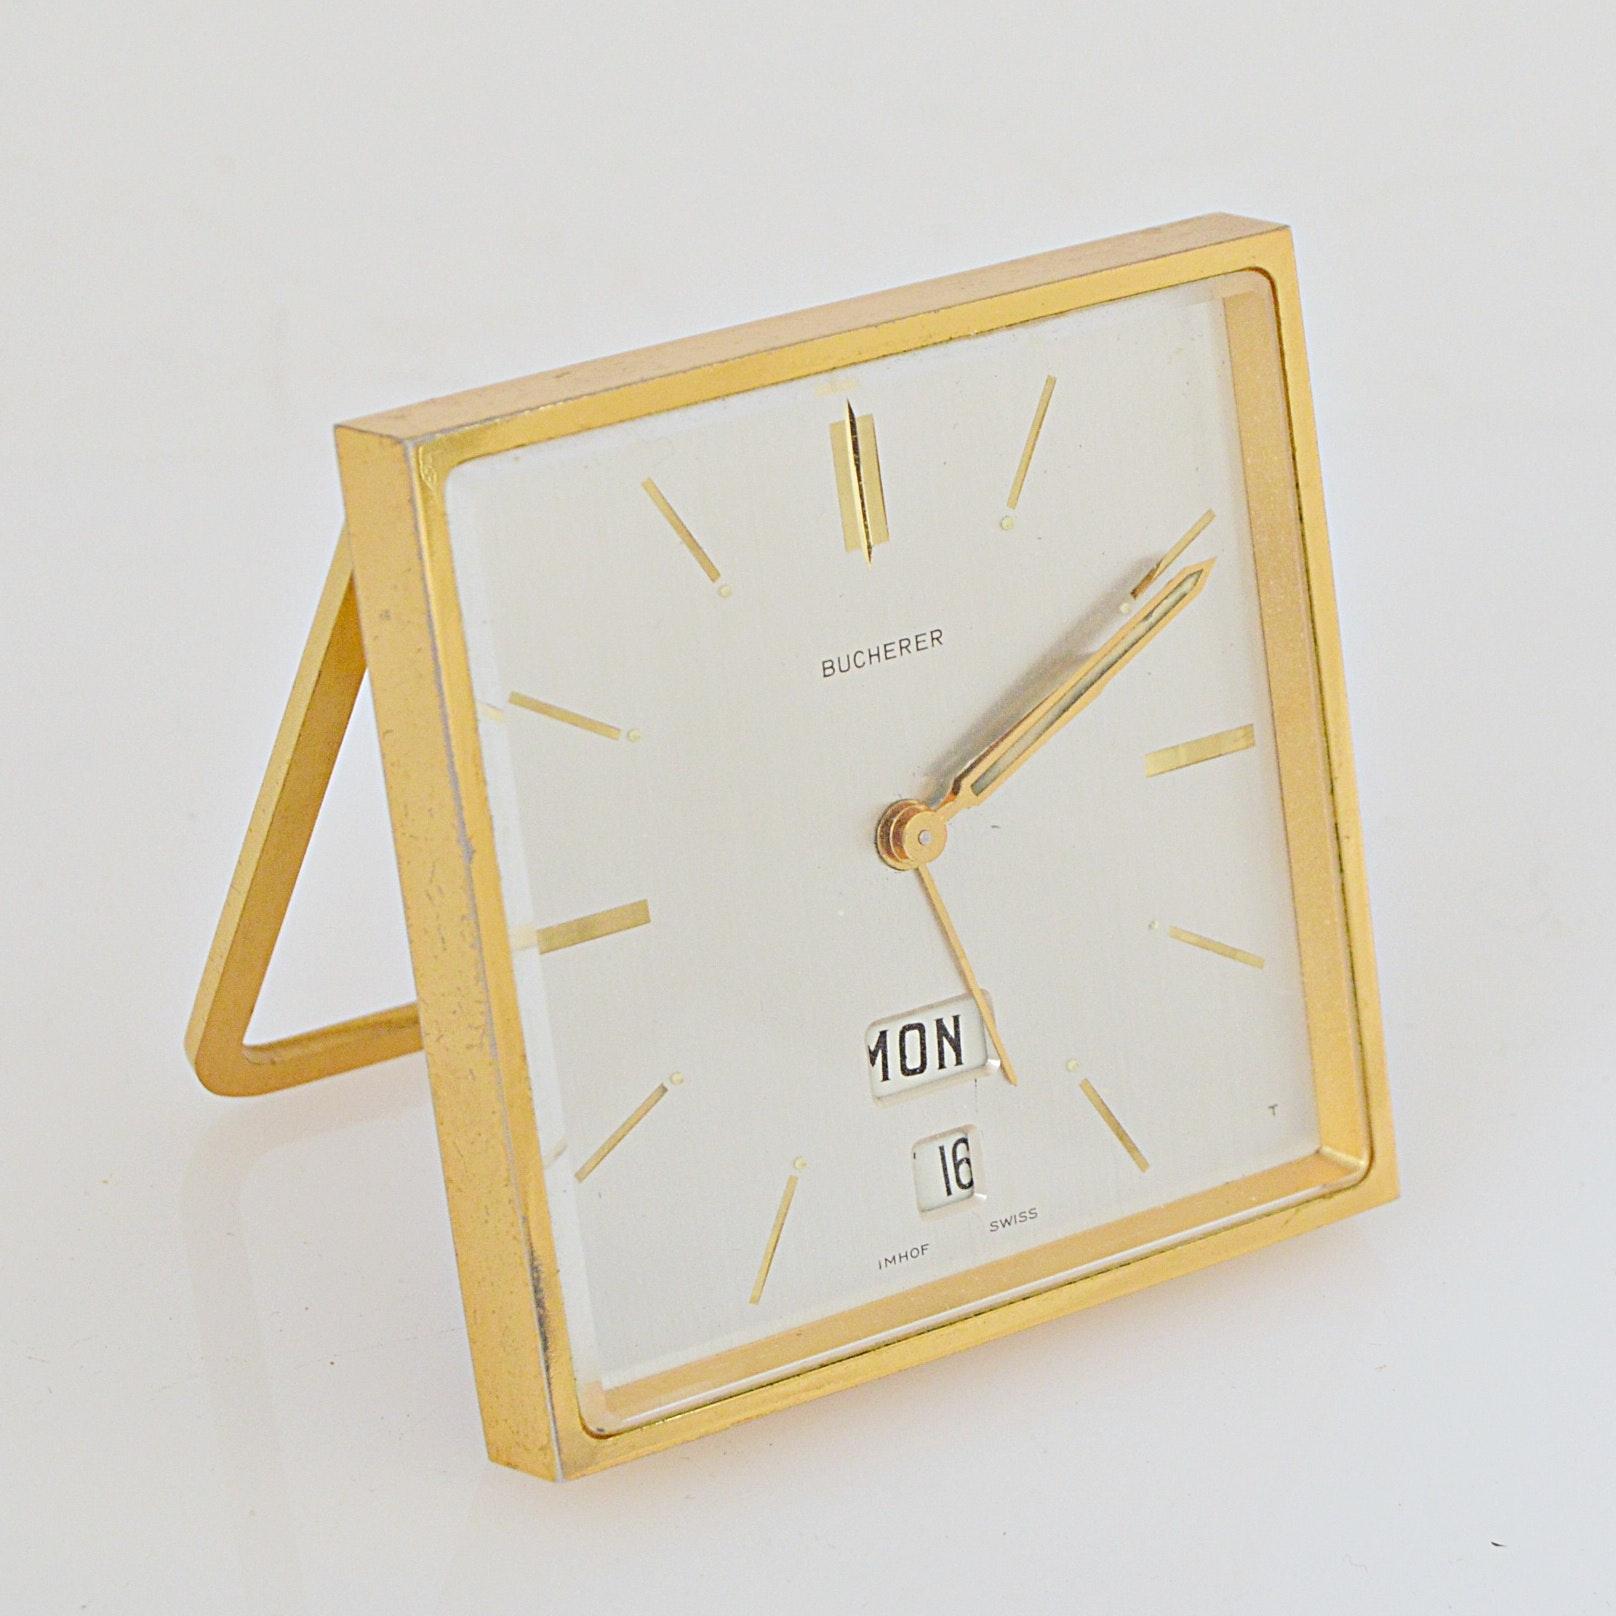 Vintage Bucherer Travel Alarm Clock